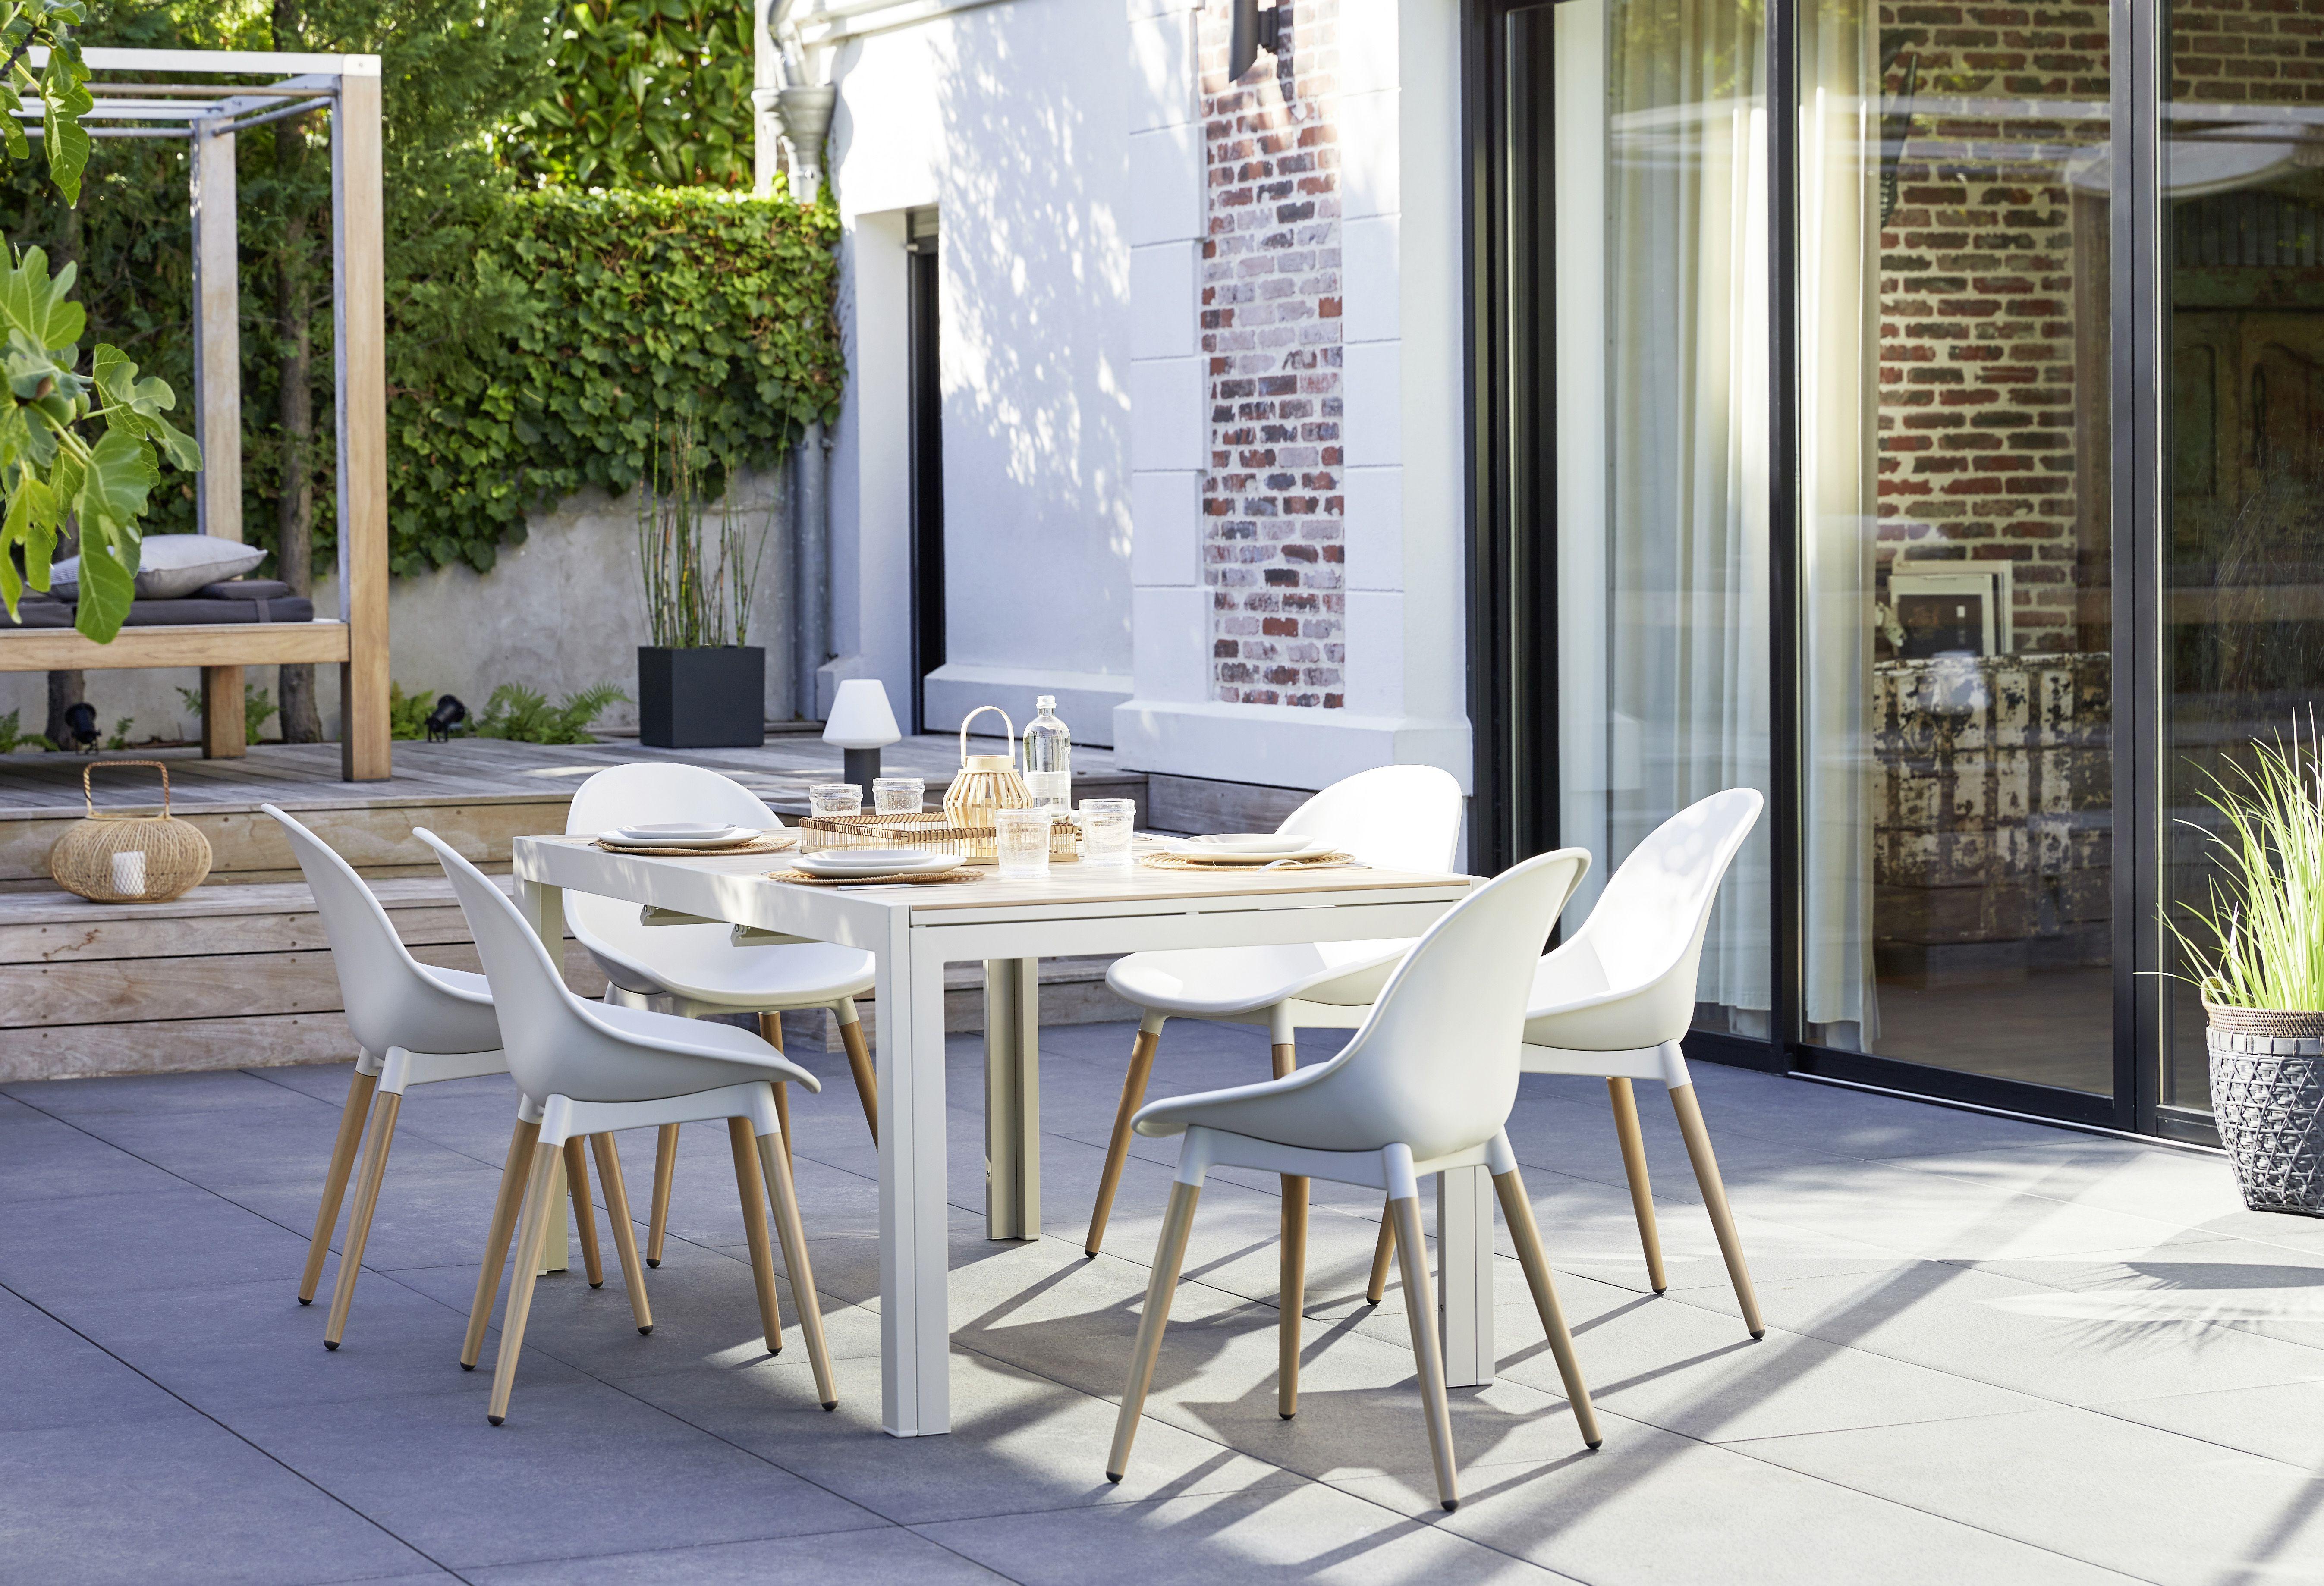 Salon De Jardin Blanc En 2020 Mobilier Jardin Meuble En Merisier Decoration Salon Cocooning